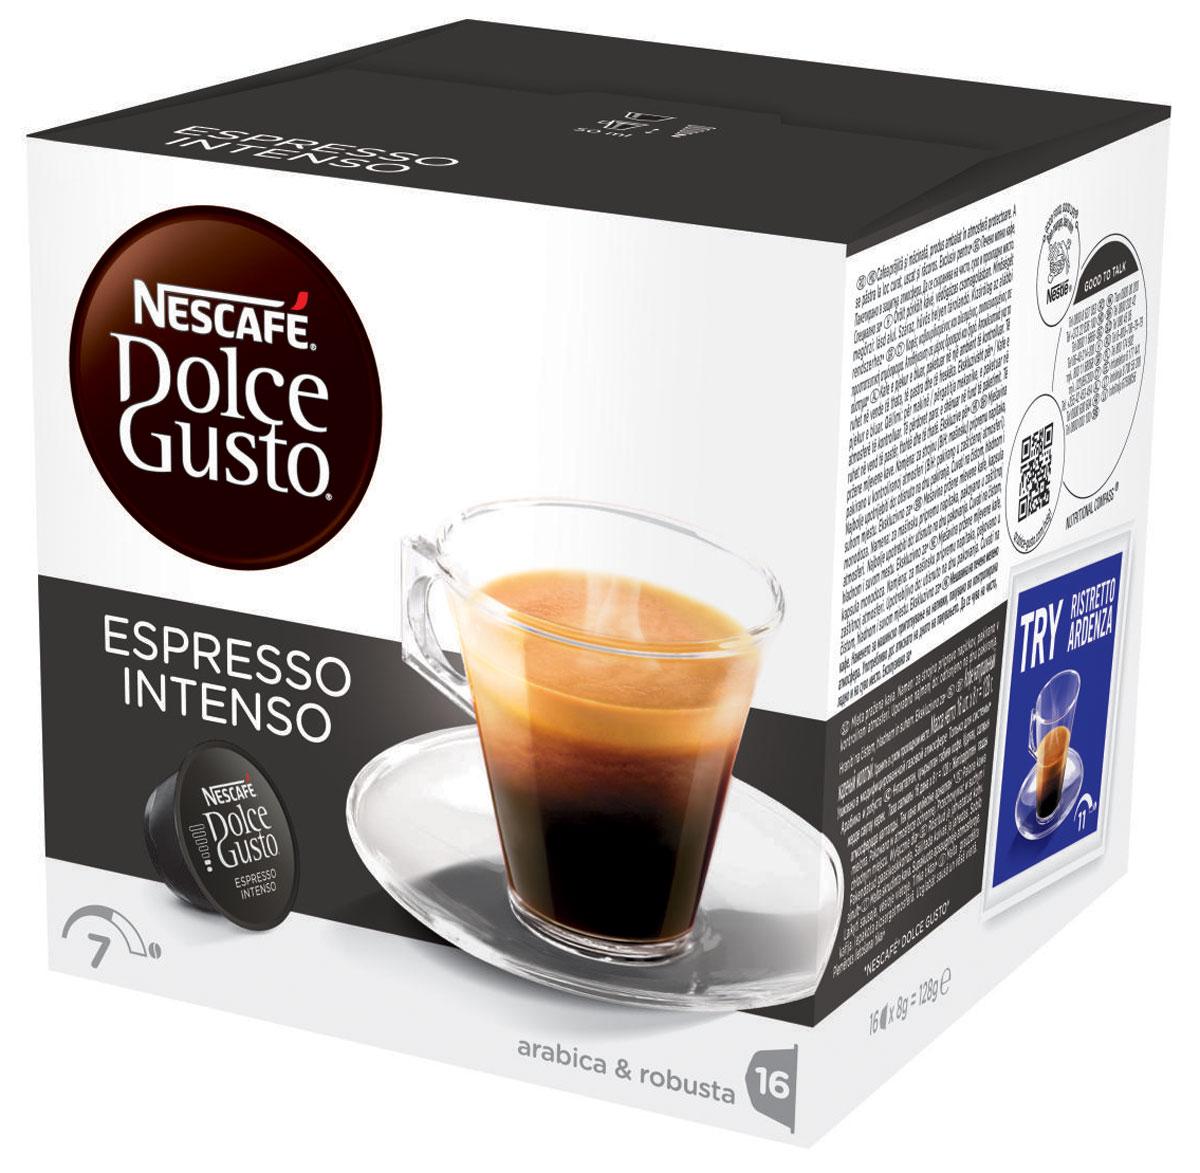 Nescafe Dolce Gusto Espresso Intenso кофе в капсулах, 16 шт tassimo jacobs espresso classico кофе в капсулах 16 шт